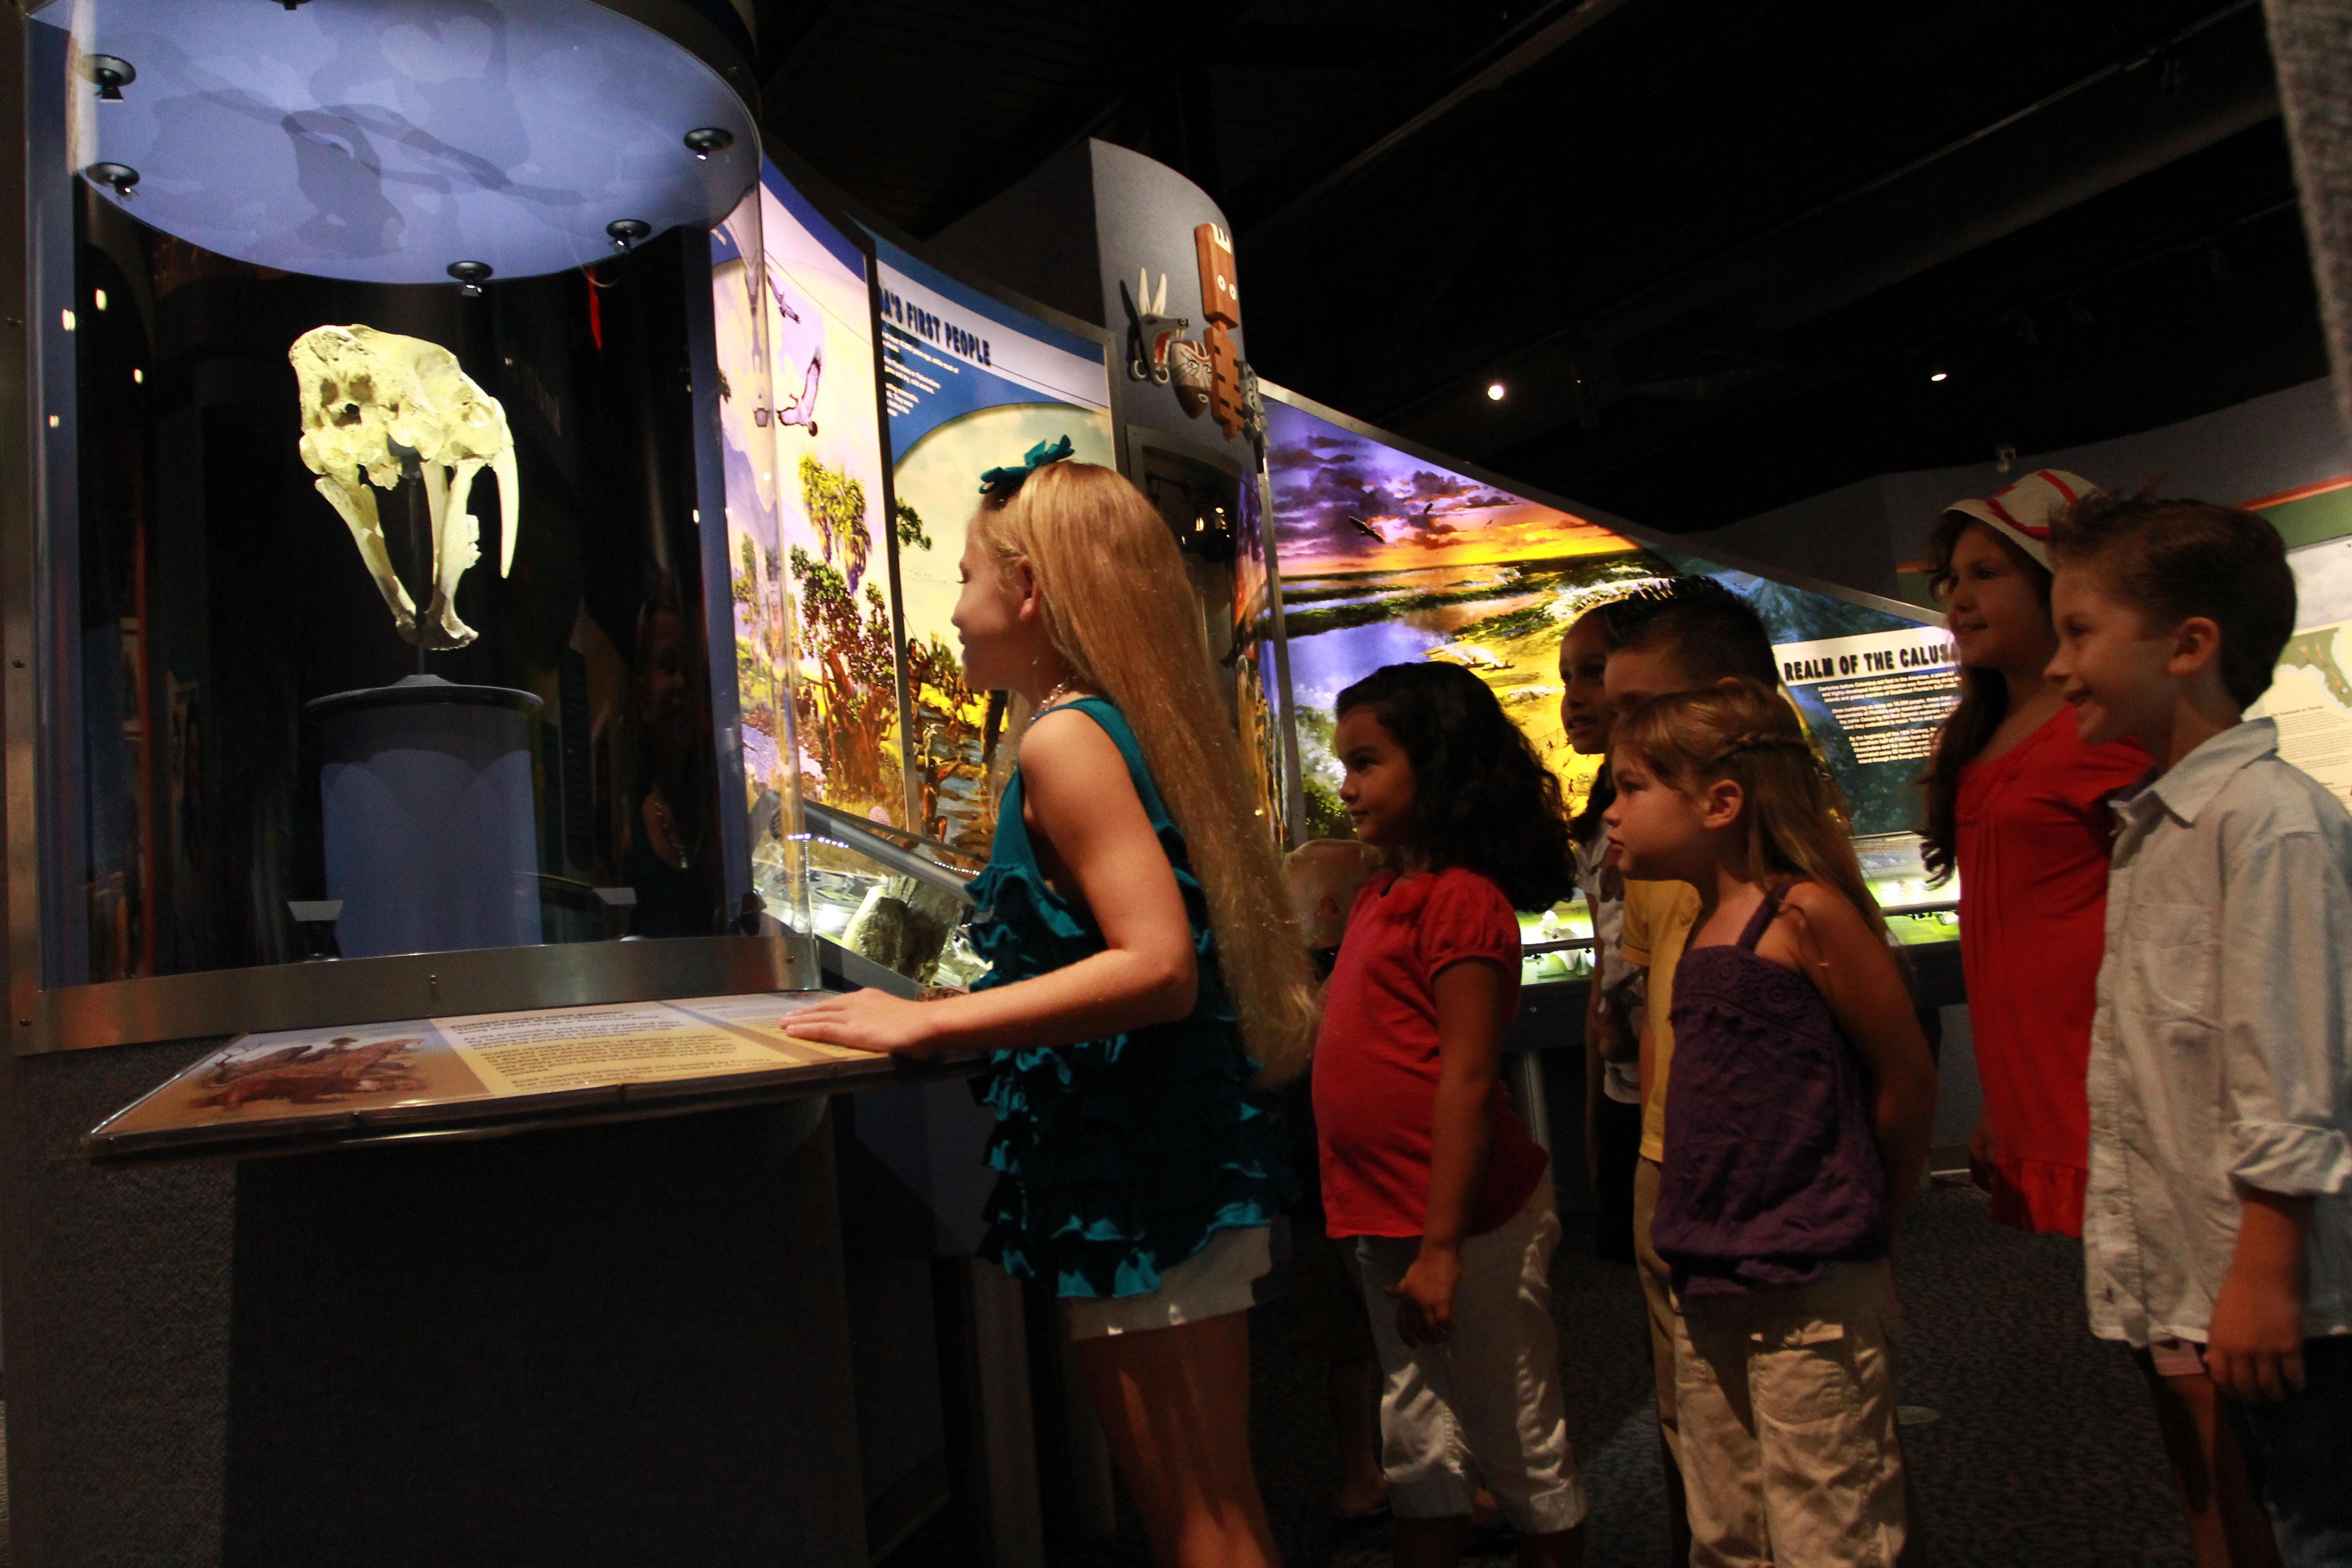 Children in exhibit hall